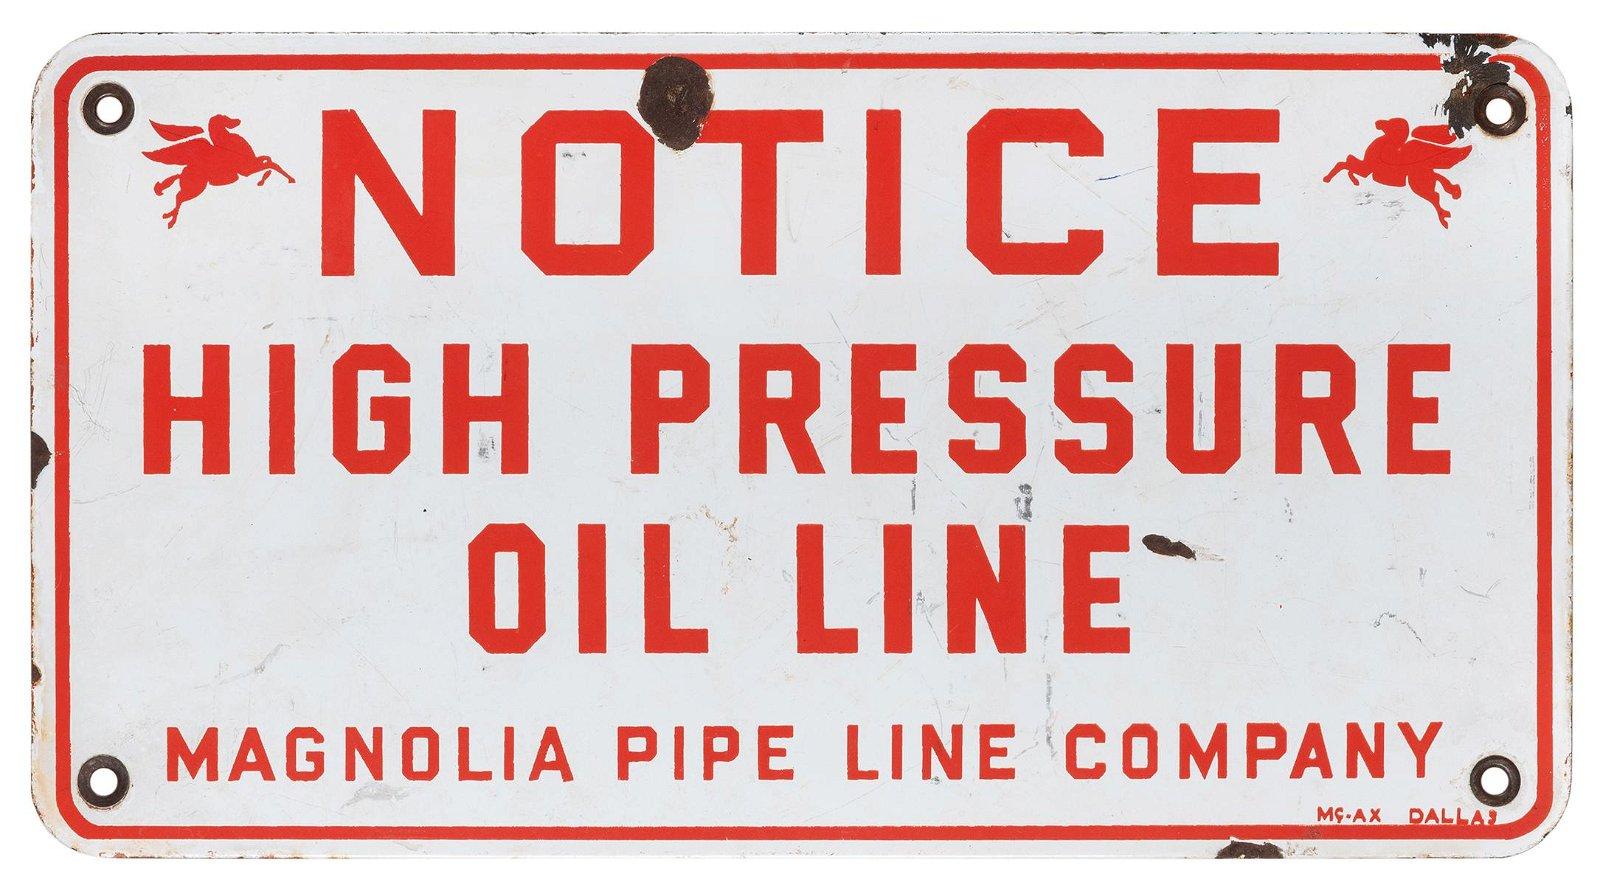 Mobil Magnolia Pipe Line Co. Oil Line Sign.